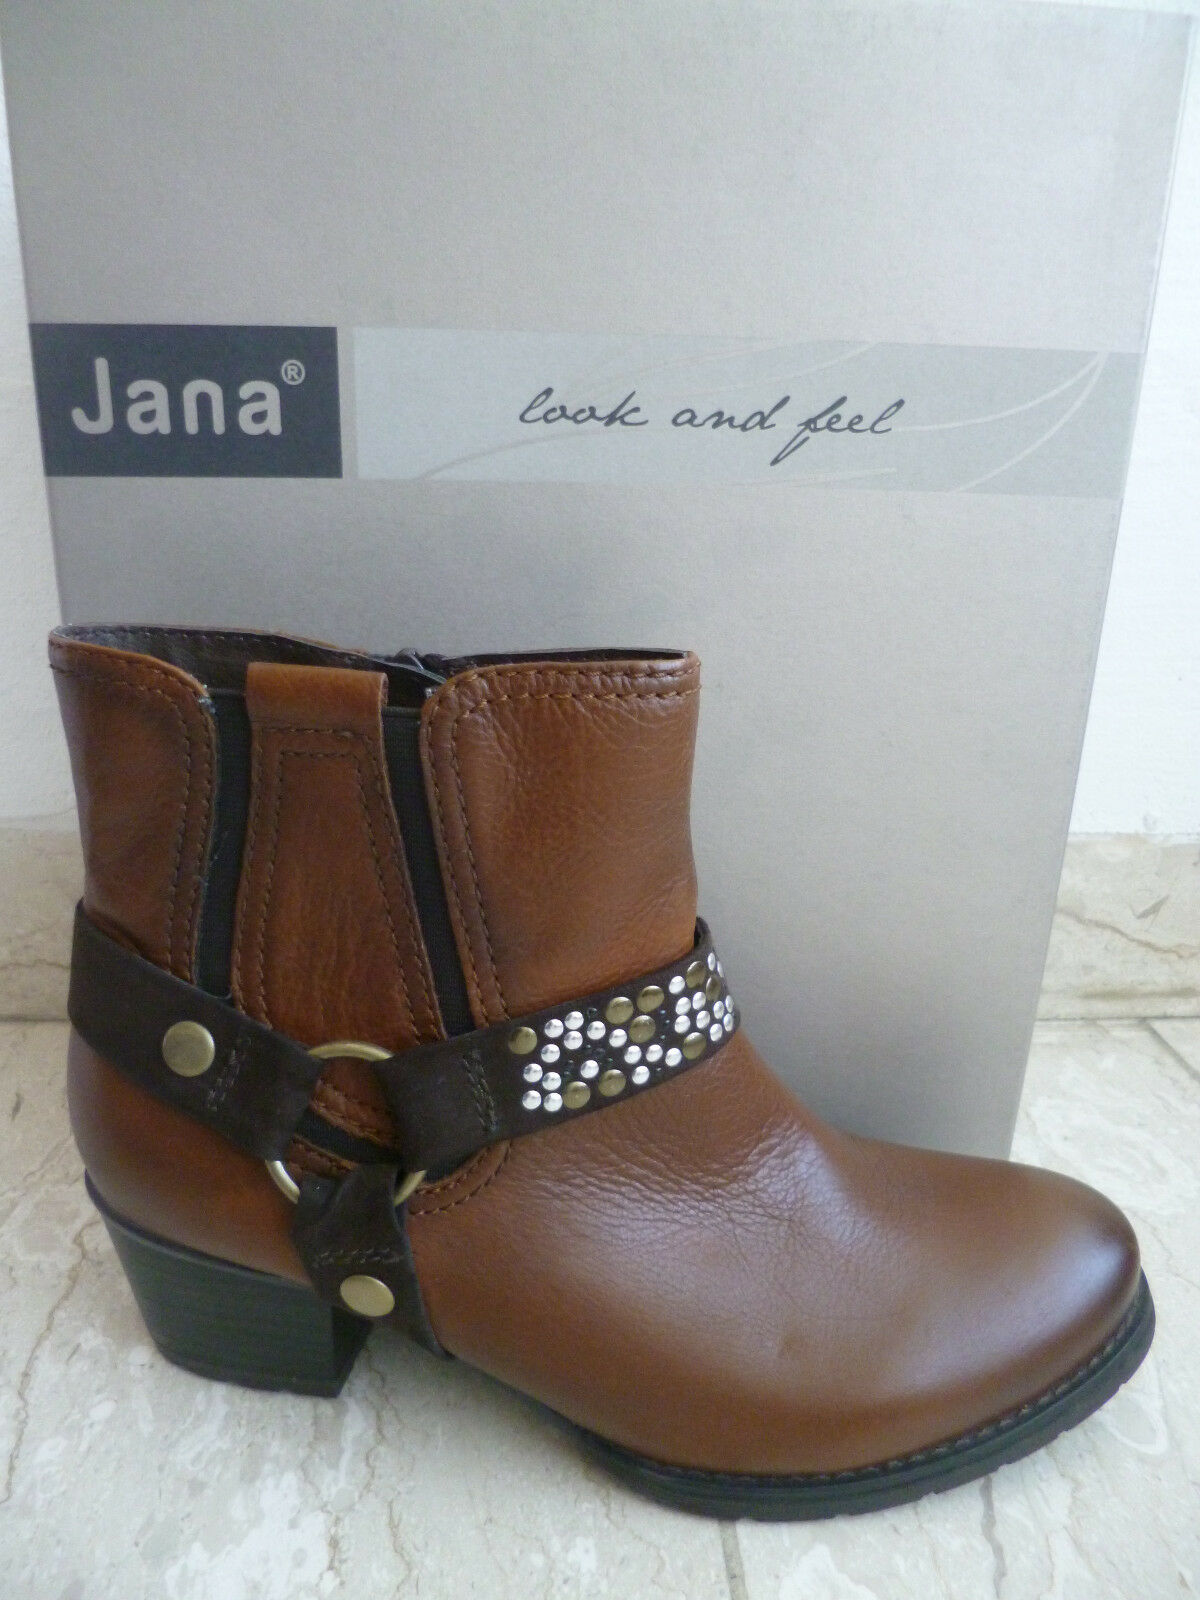 Jana leicht Stiefelette, braun, Weite H, leicht Jana gefüttert Echtleder 25328 NEU cc286e